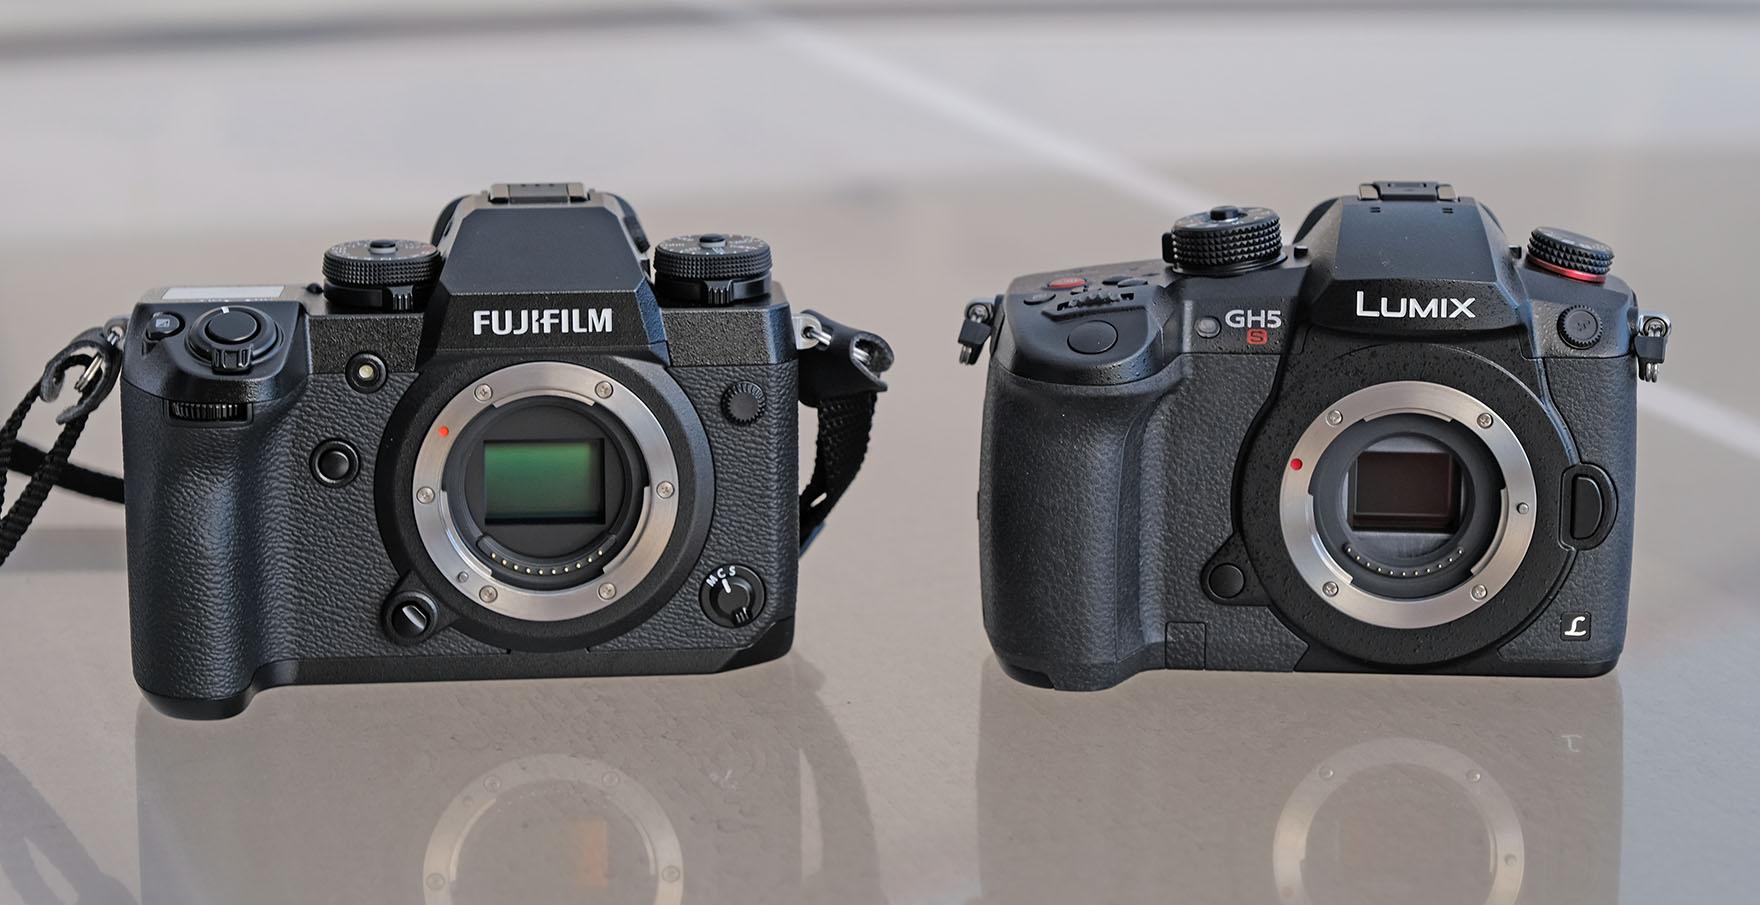 Fujifilm X-H1: High Performance Mit IBIS